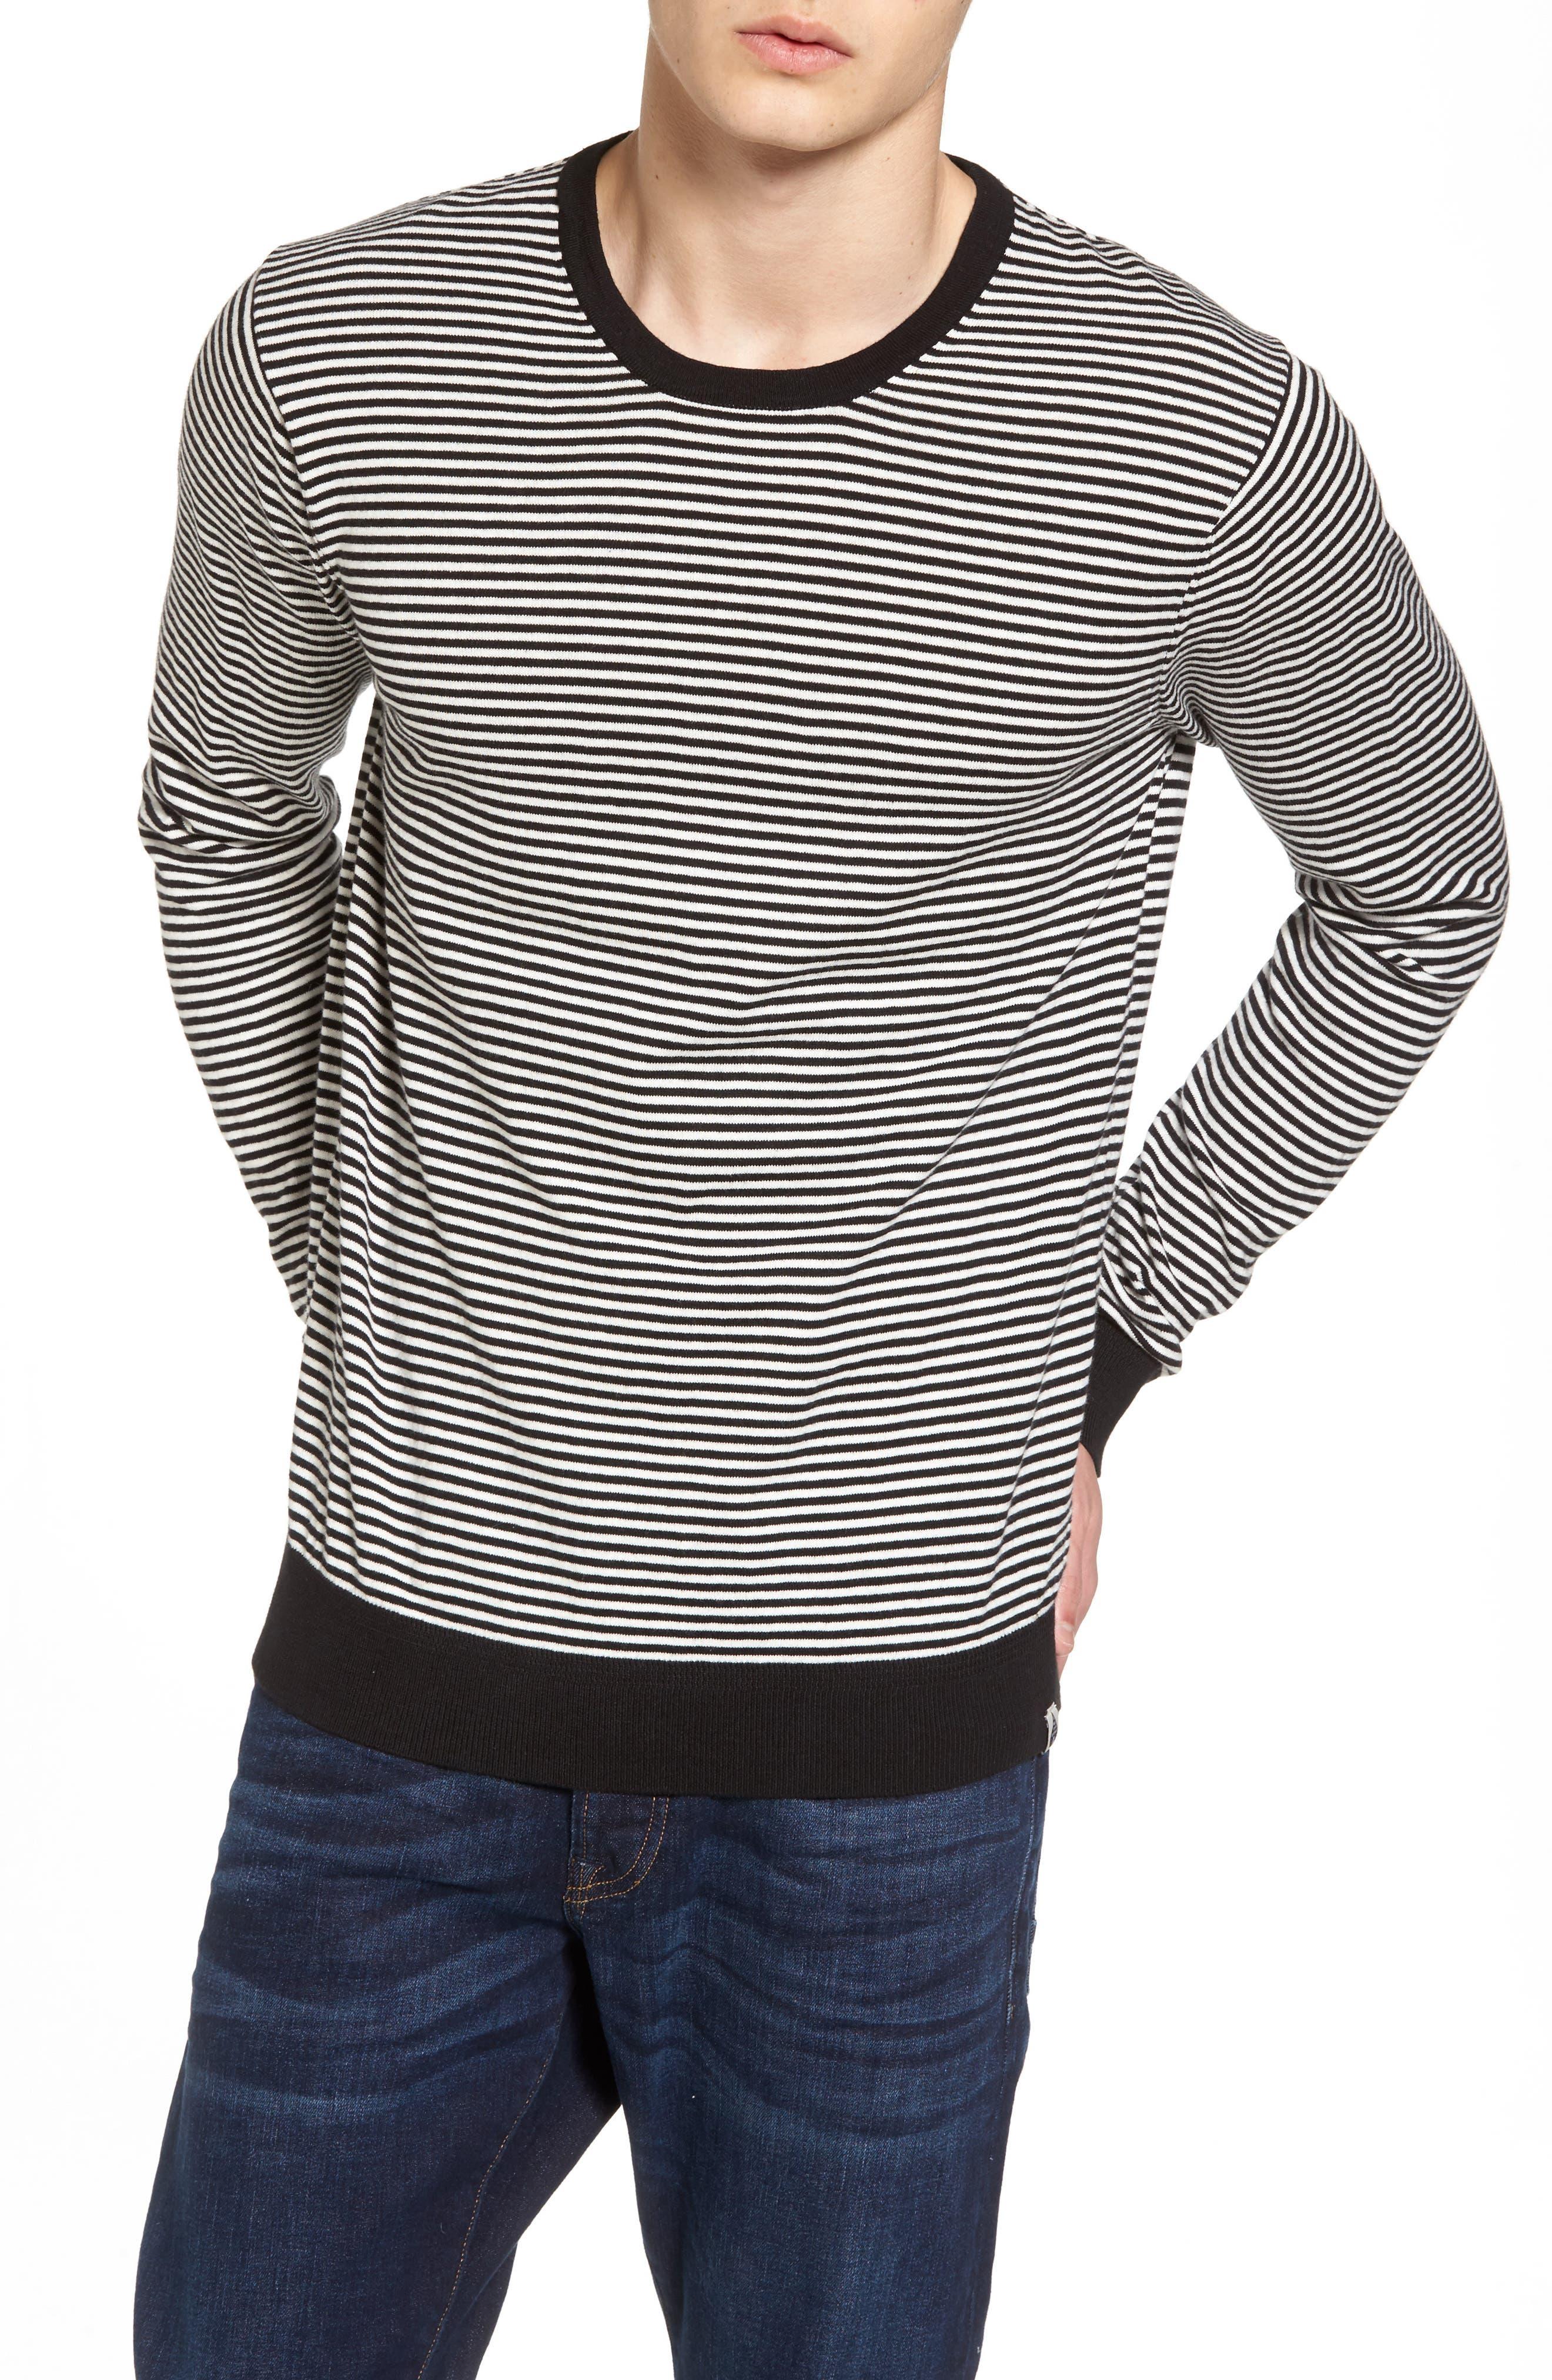 Blauw T-Shirt,                         Main,                         color, Black/ Black